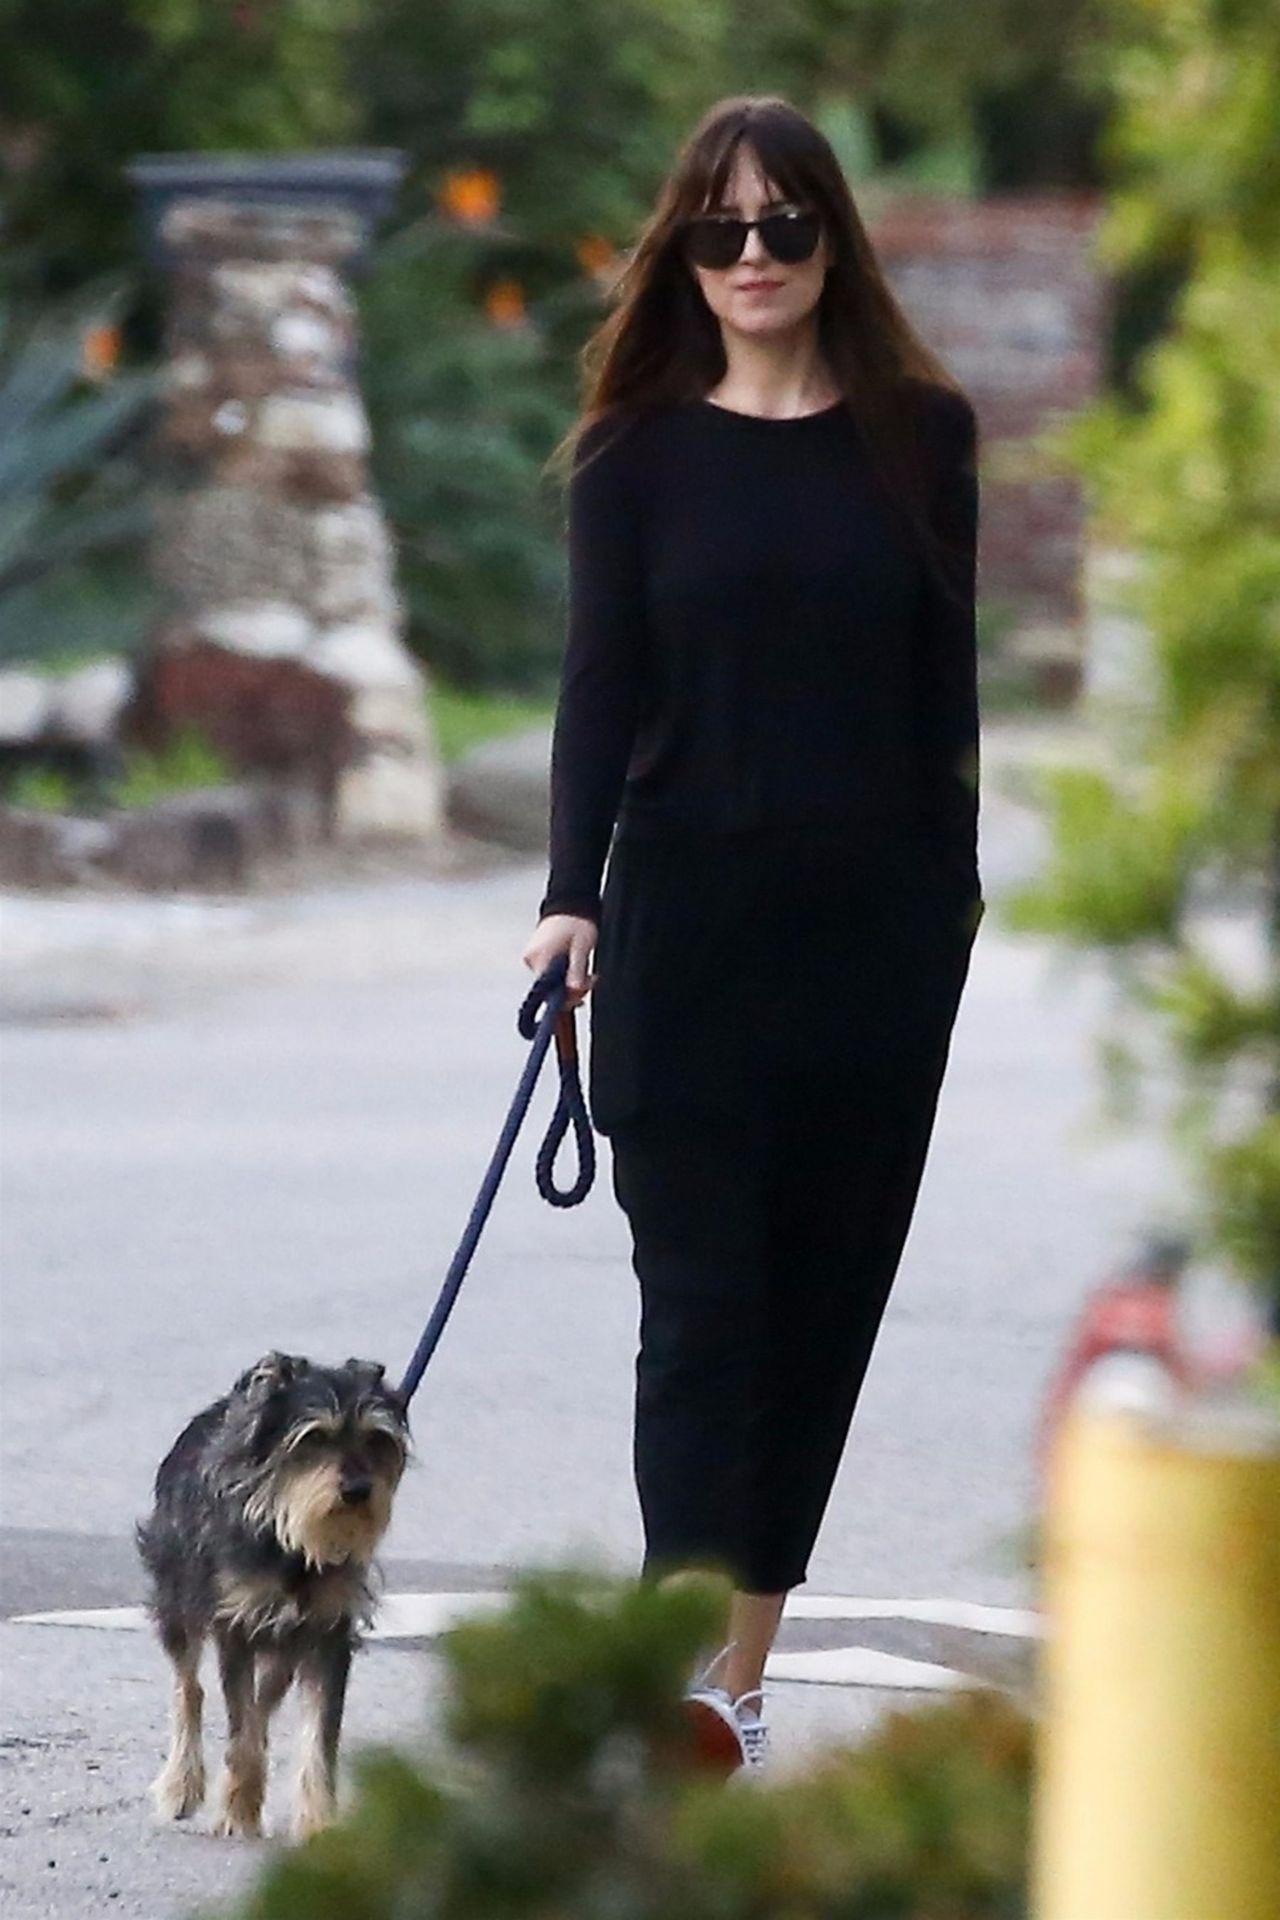 Dakota Johnson Took Her Dog Out For A Walk In Malibu 01